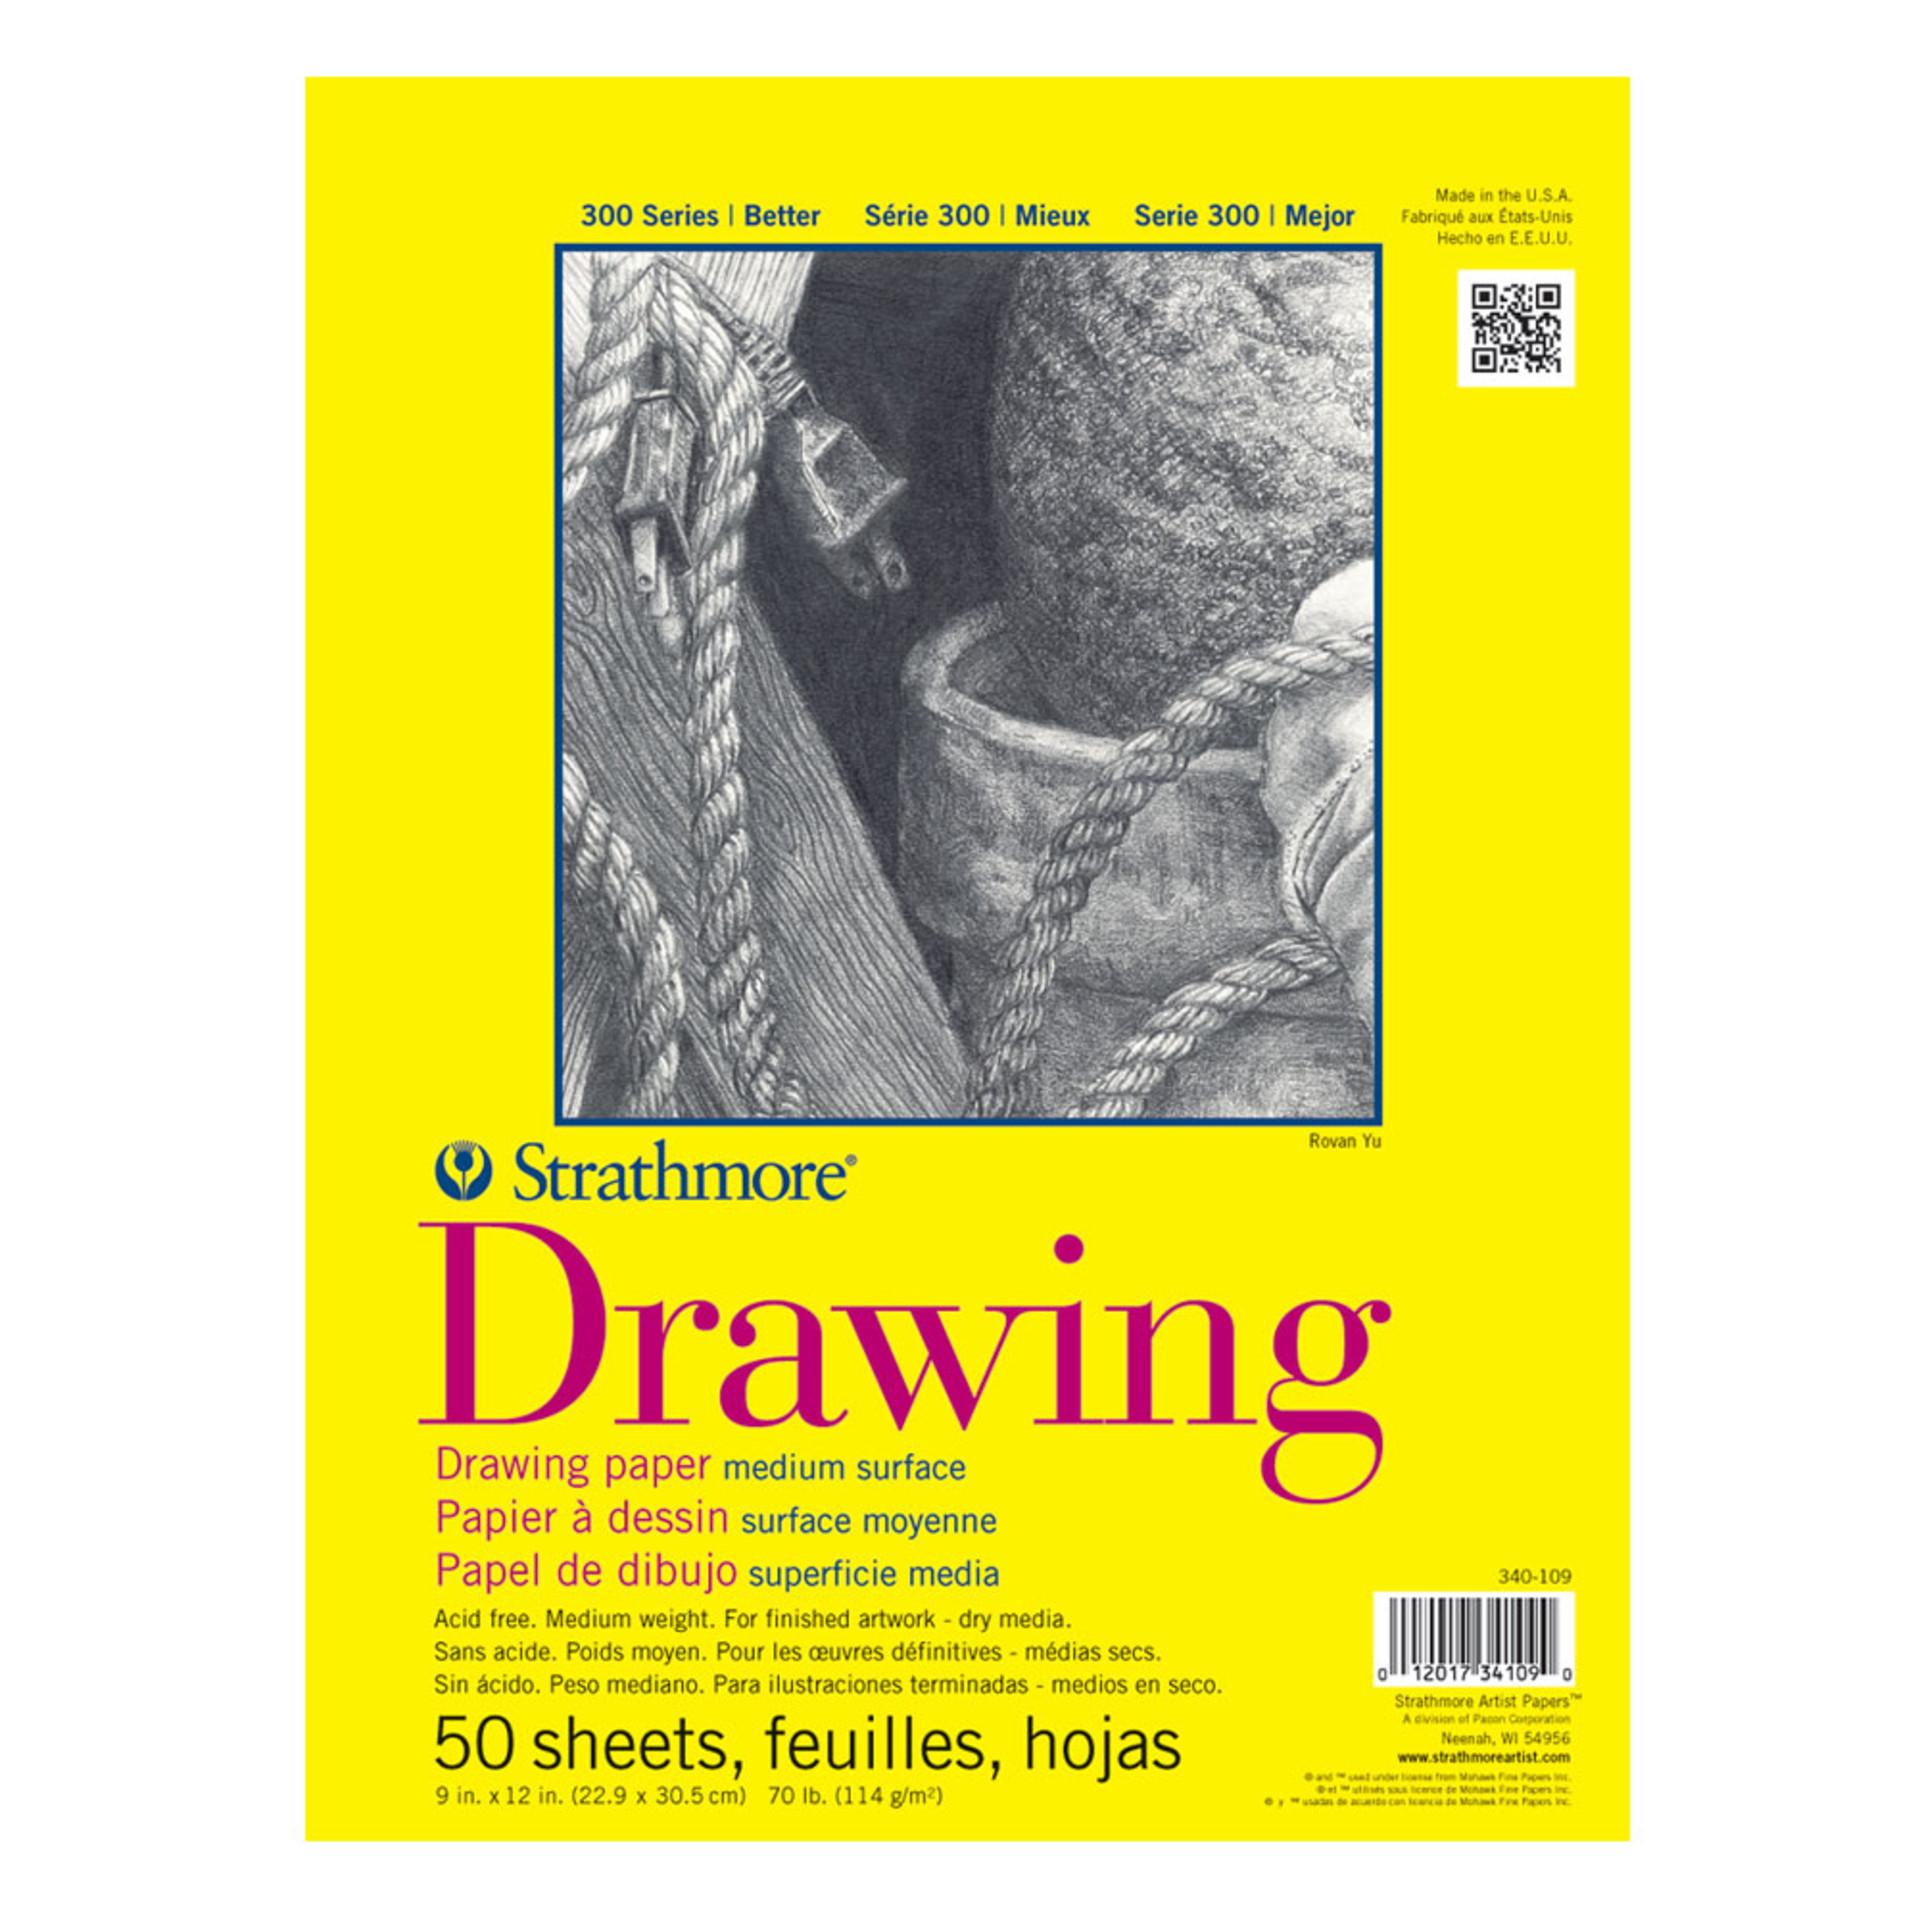 Strathmore Drawing Pad 300 Series